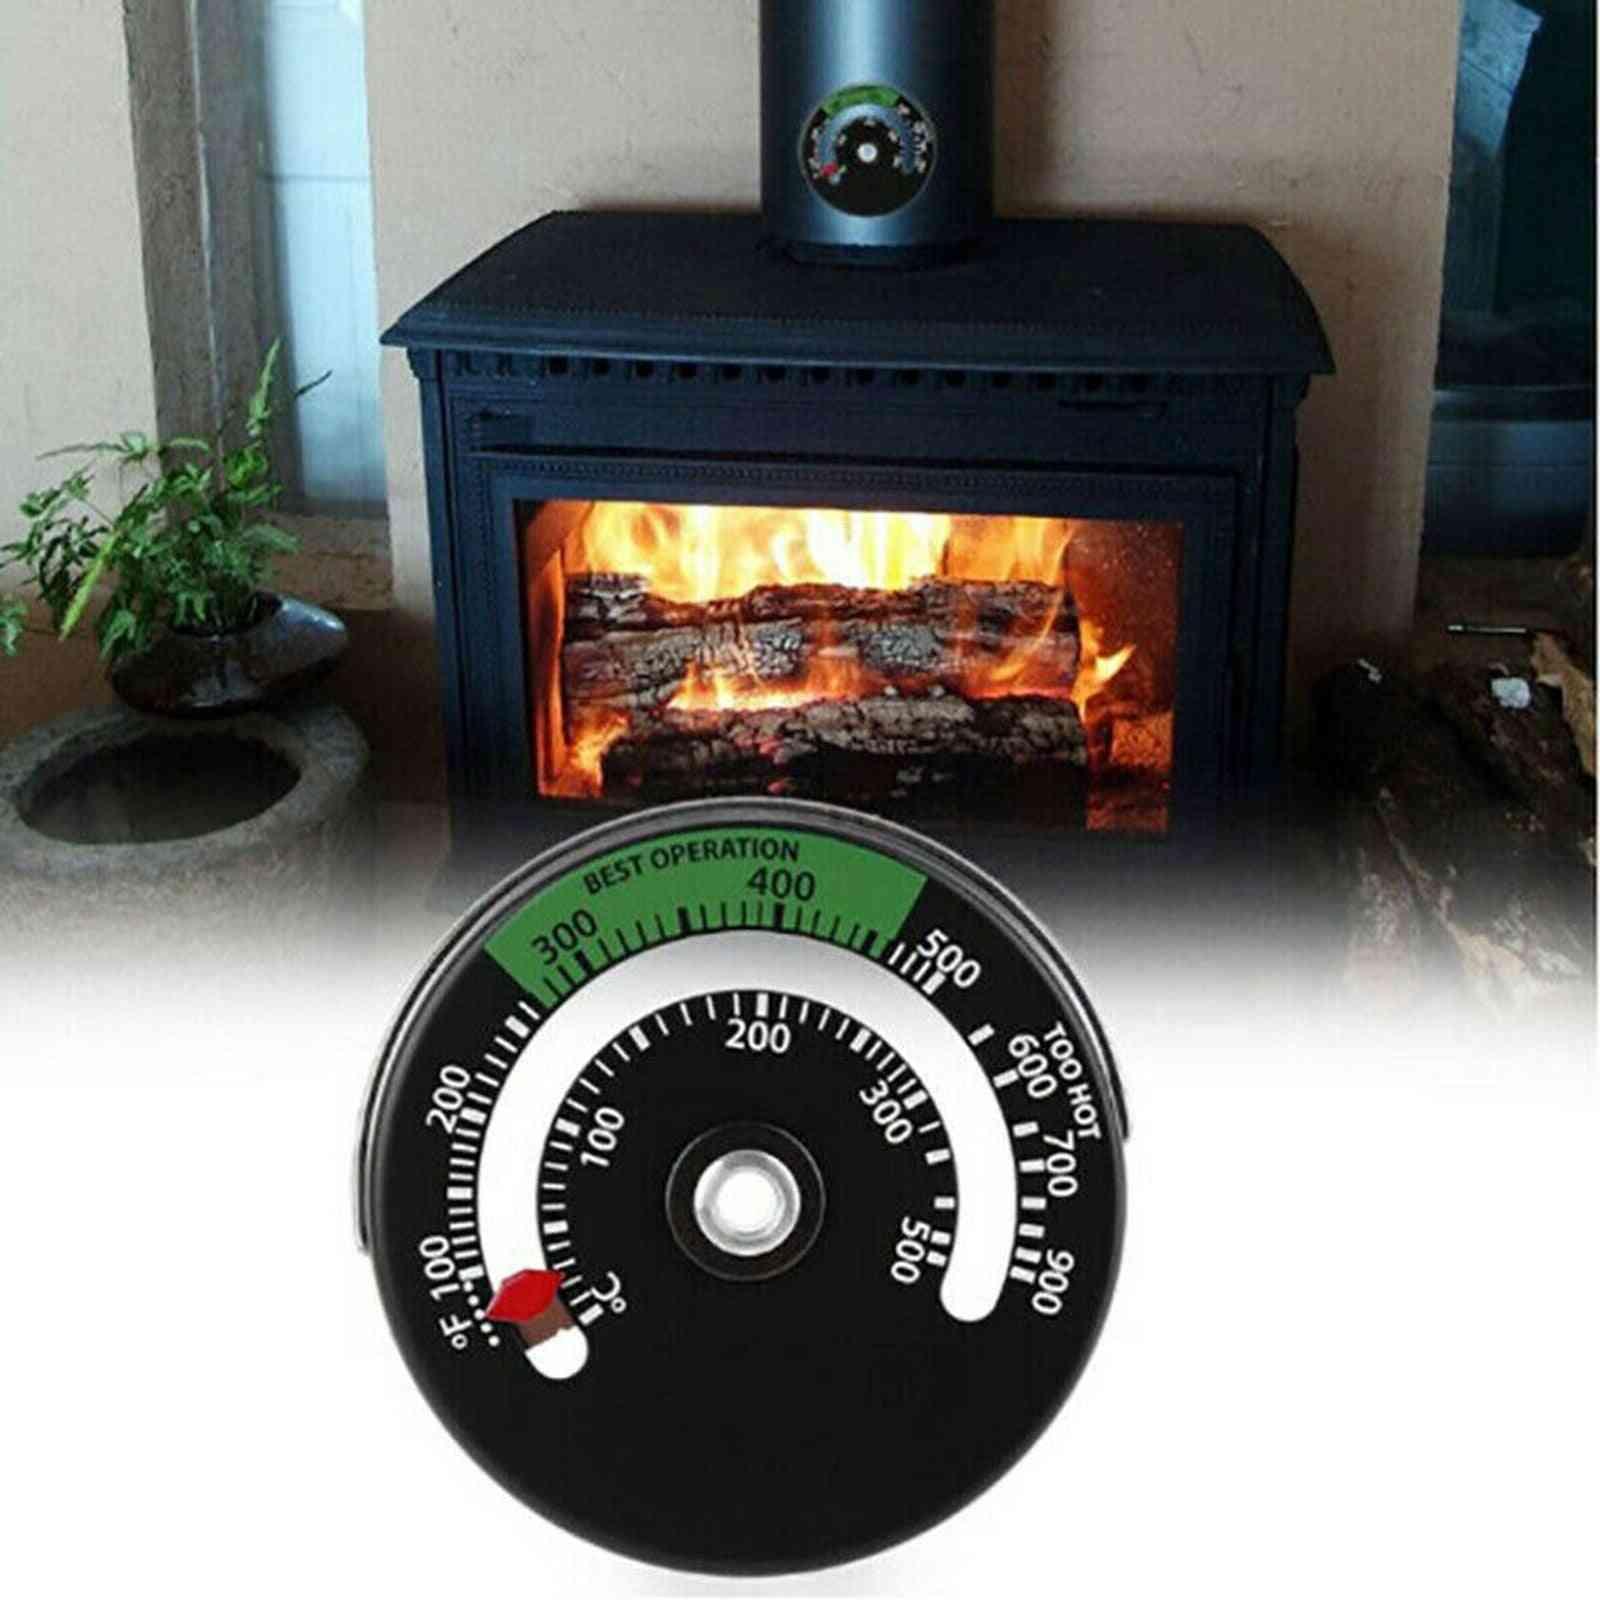 Magnetic Woodstove Pipe Thermometer Fireplace Flue Burner Heat Temperature Gauge Multi Fuel (black)